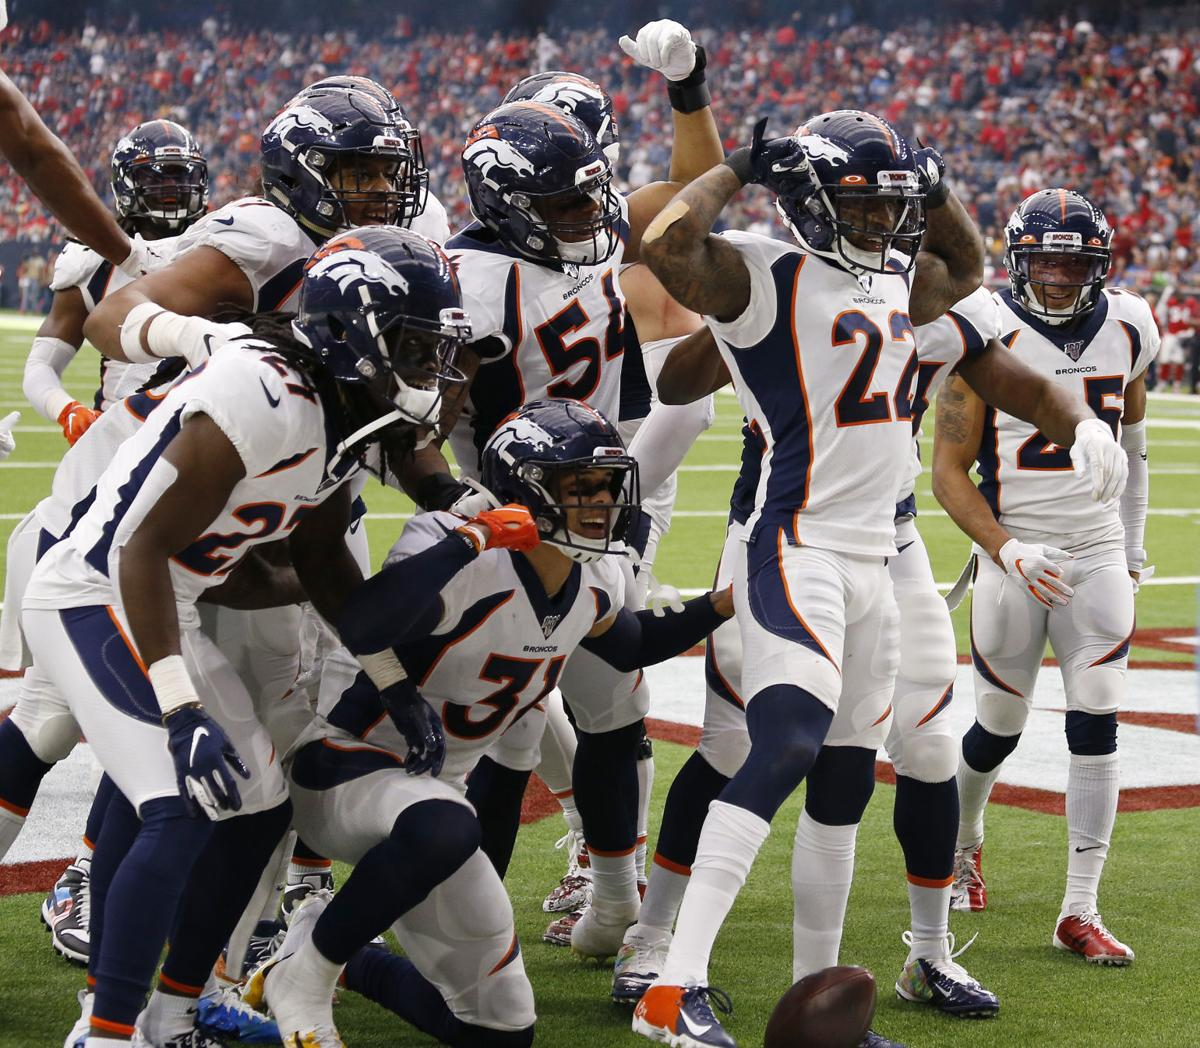 Houston Texans vs. Denver Broncos